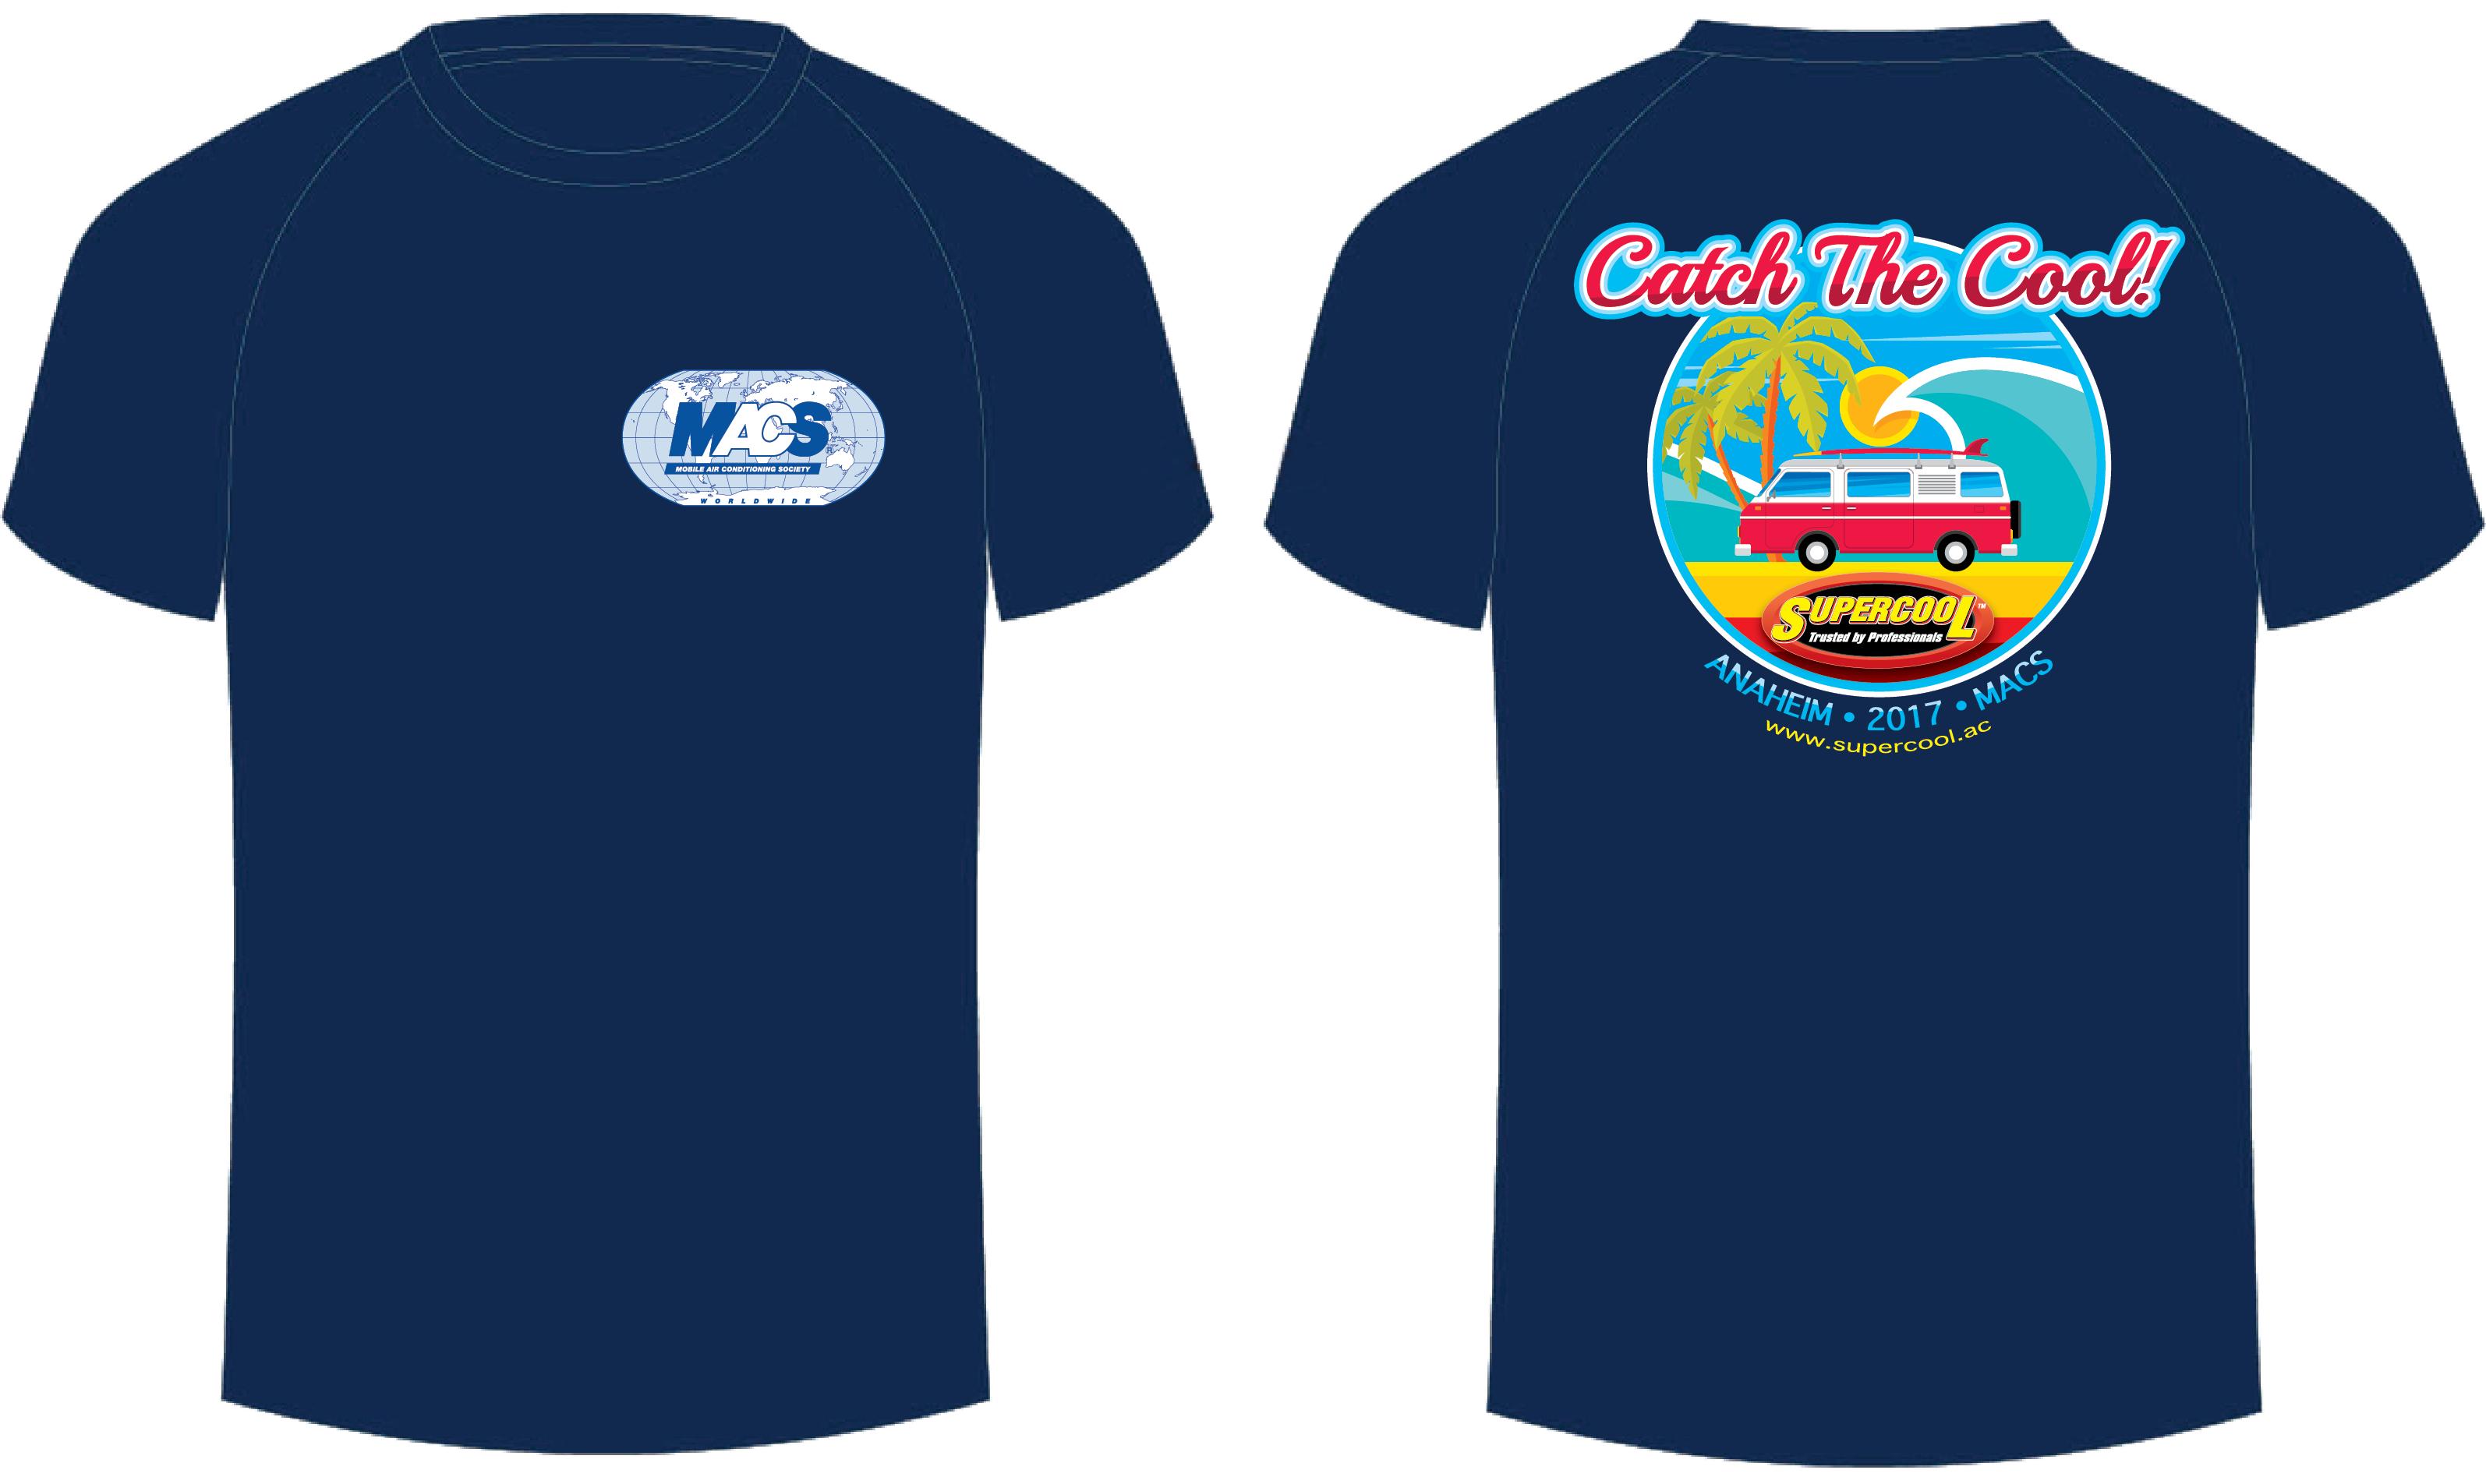 football t shirt design ideas home design ideas - Football T Shirt Design Ideas